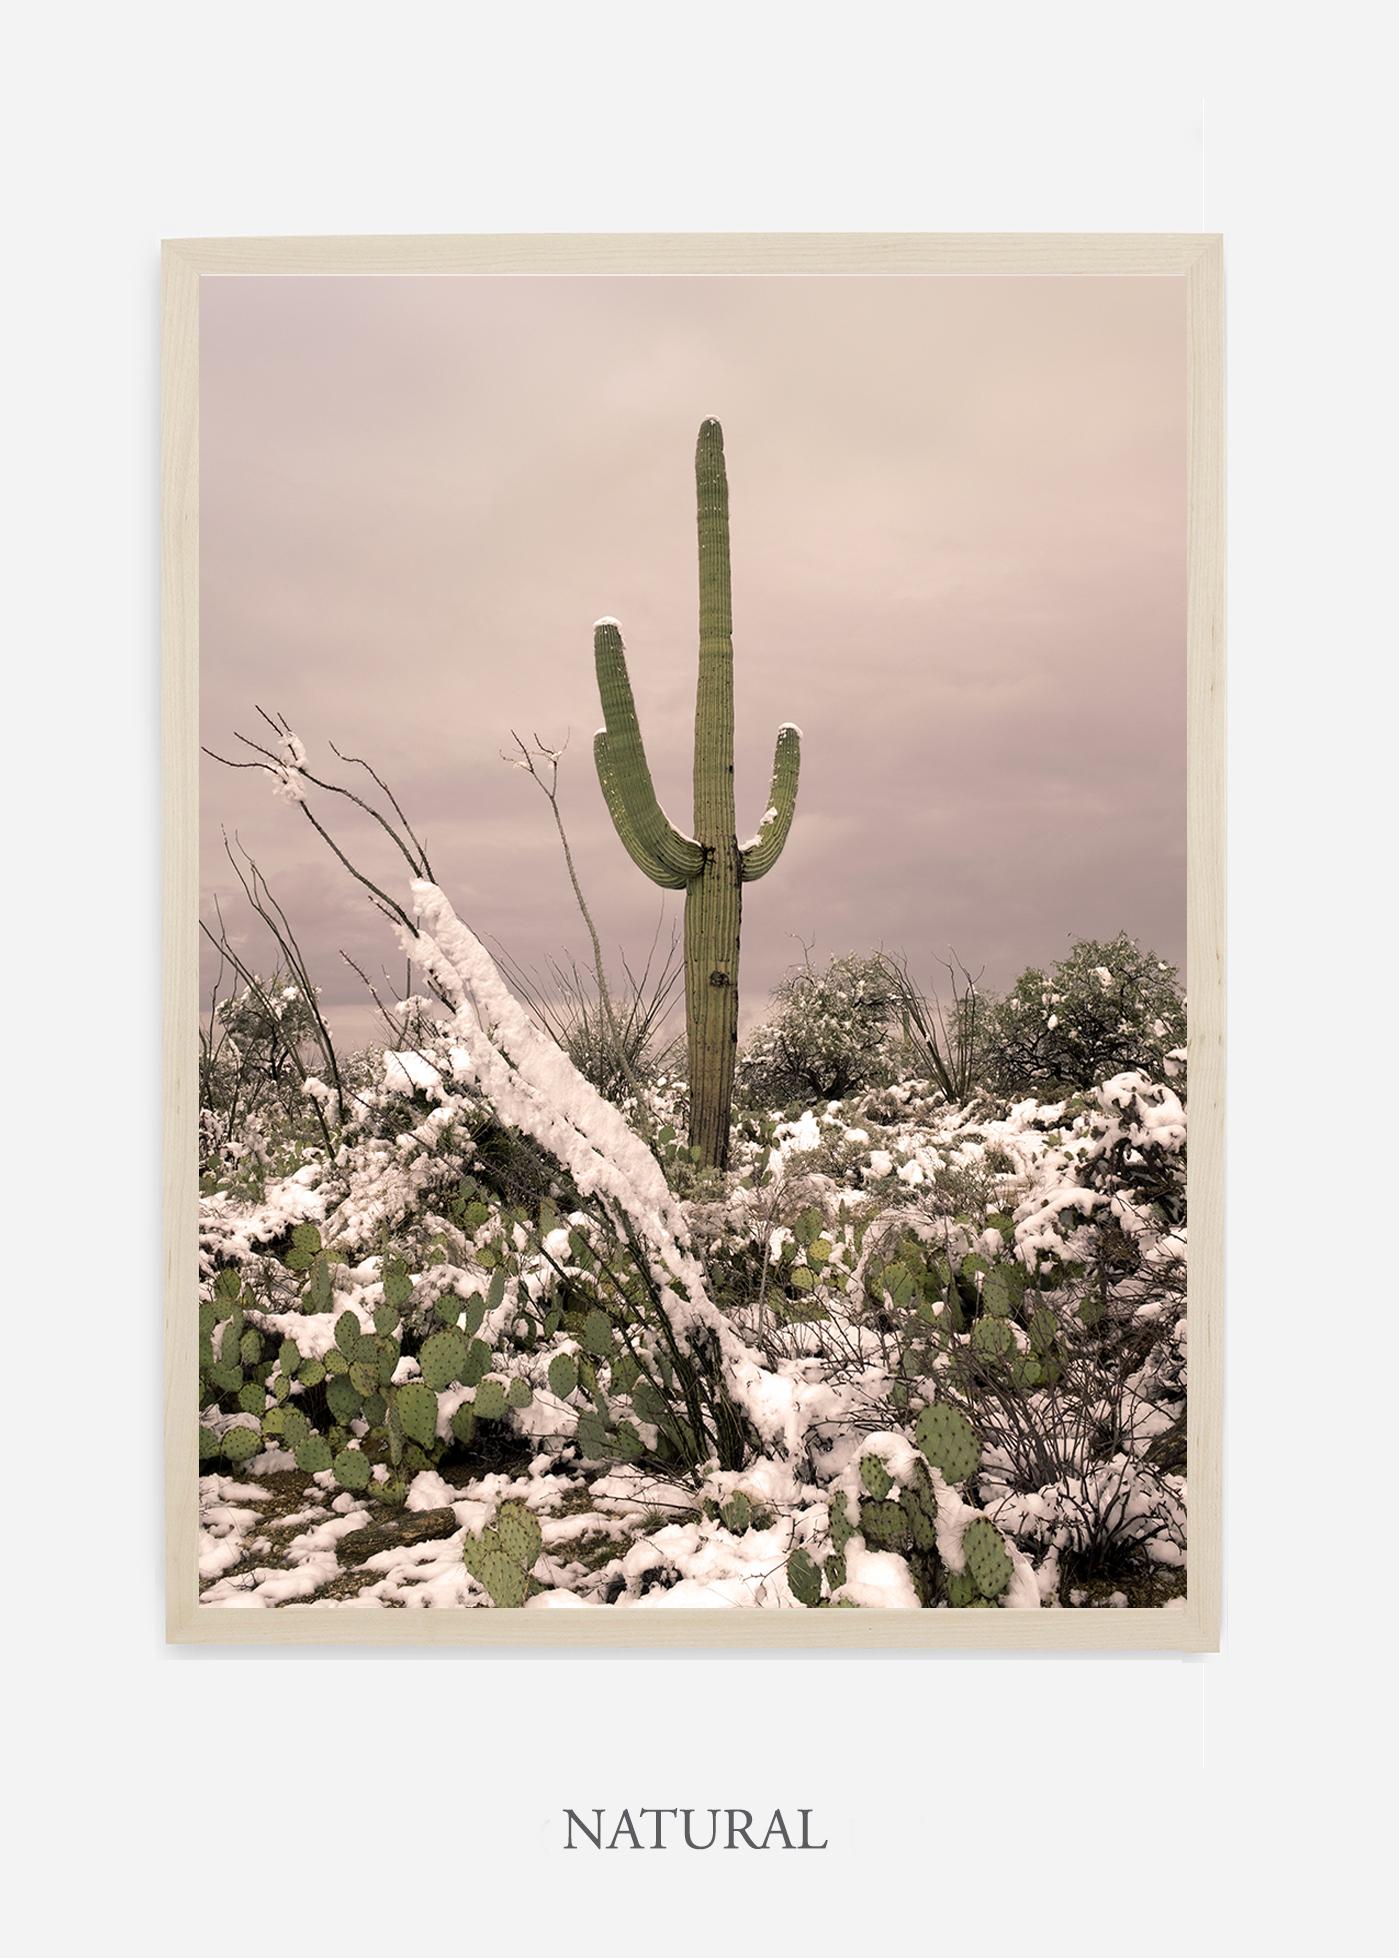 nomat-naturalframe-saguaroNo.4-wildercalifornia-art-wallart-cactusprint-homedecor-prints-arizona-botanical-artwork-interiordesign.jpg